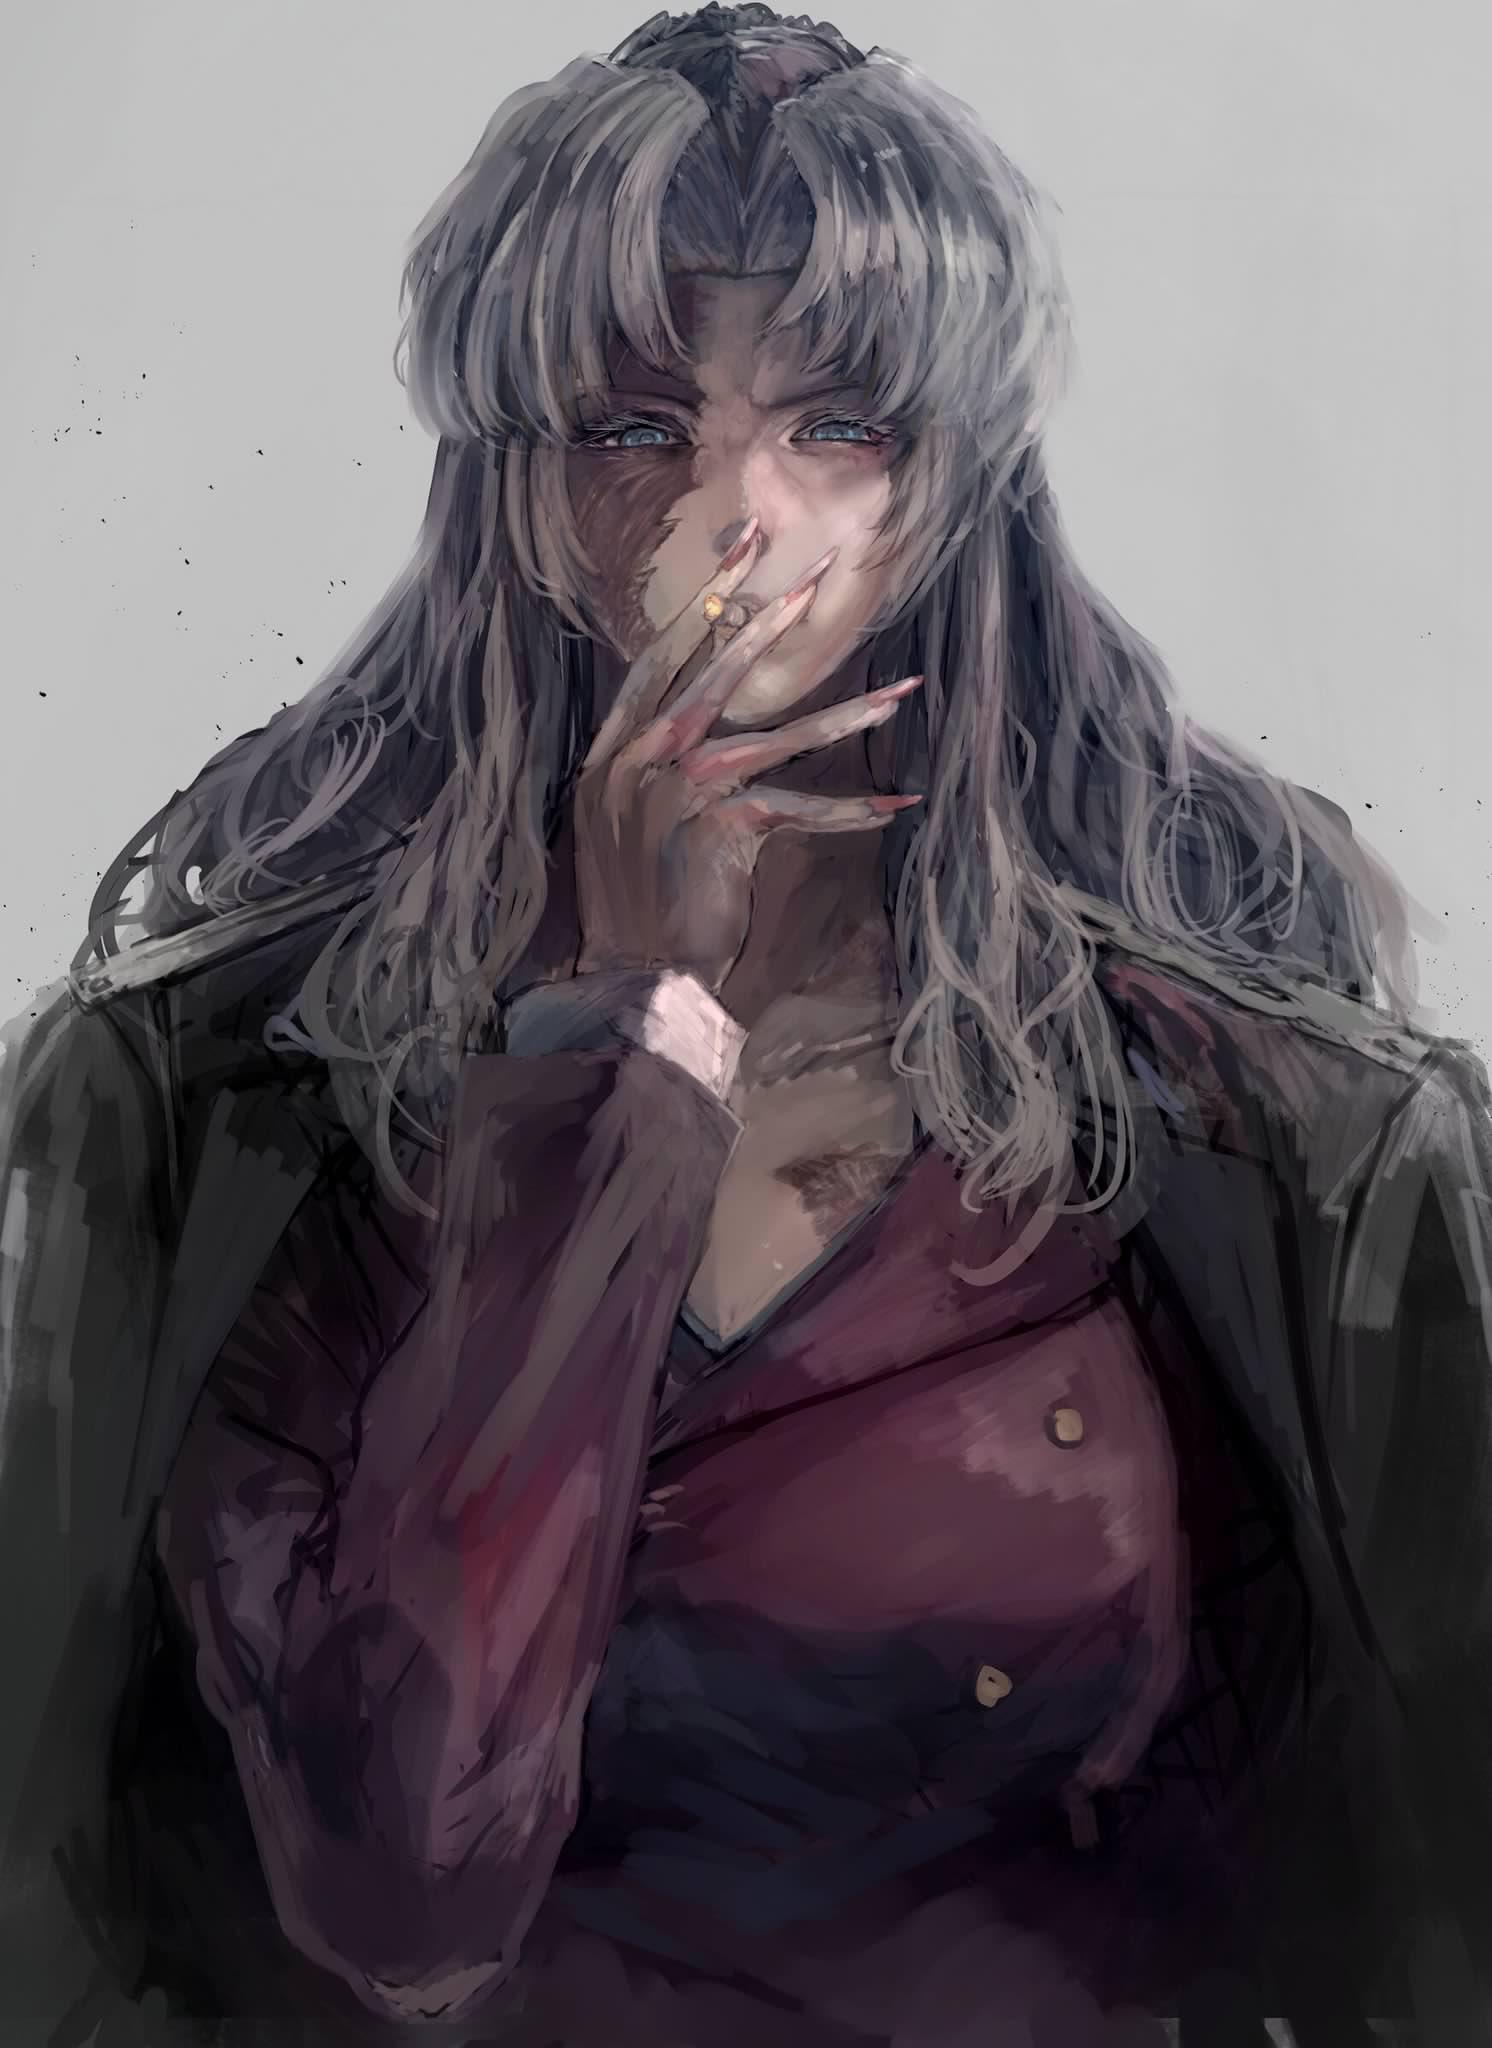 Pin by Richter on fantasy art Black lagoon anime